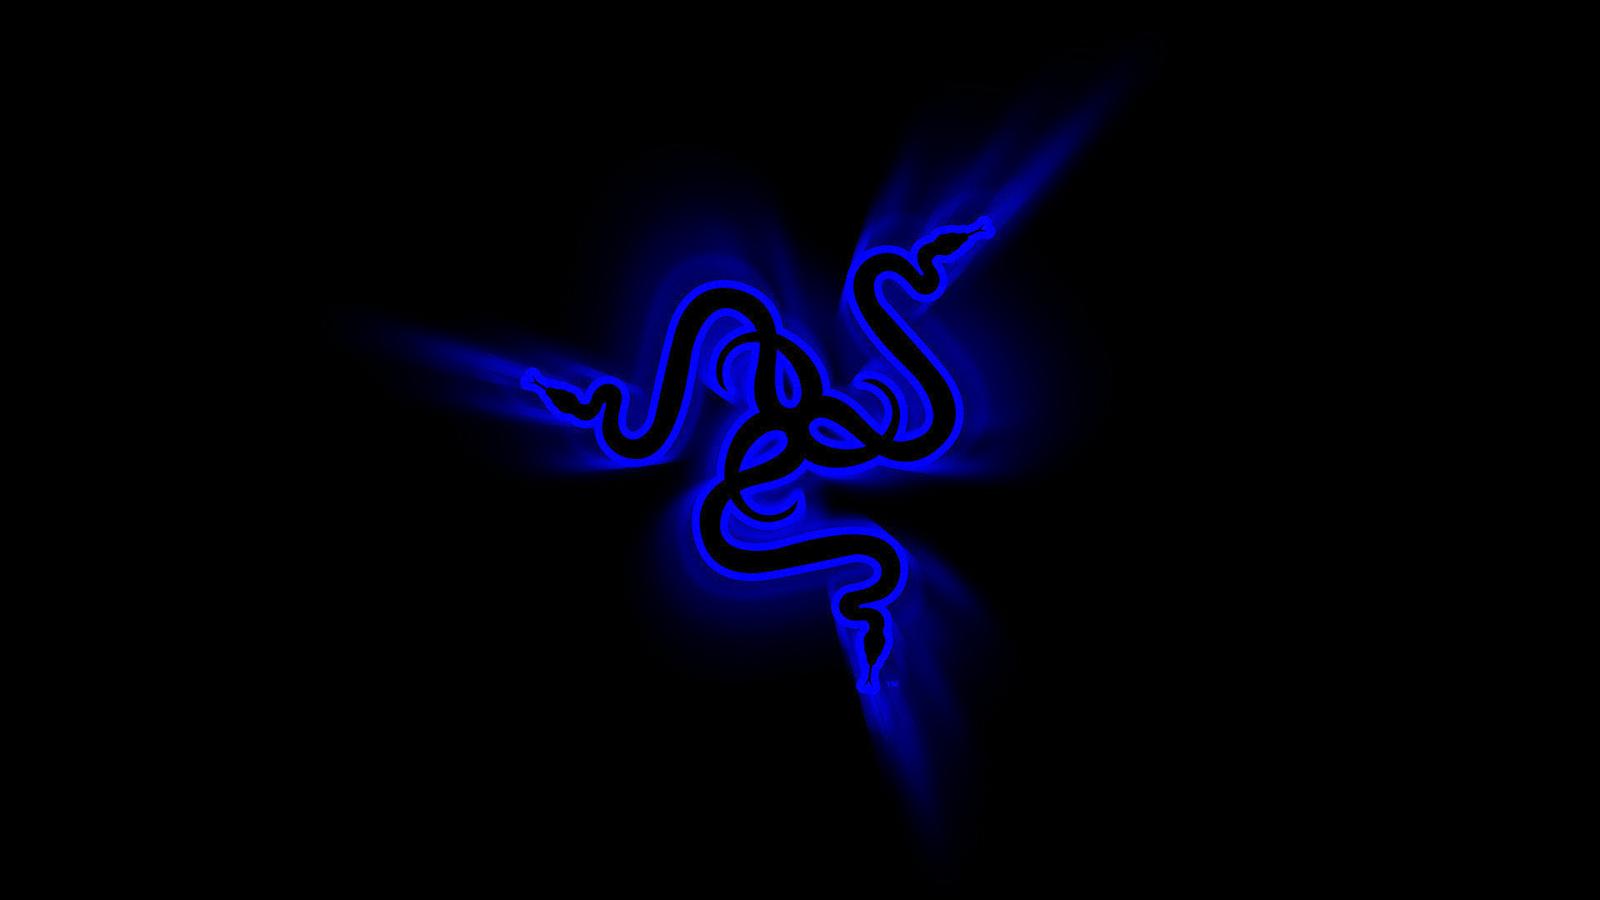 Razer Blue Wallpapers on WallpaperSafari